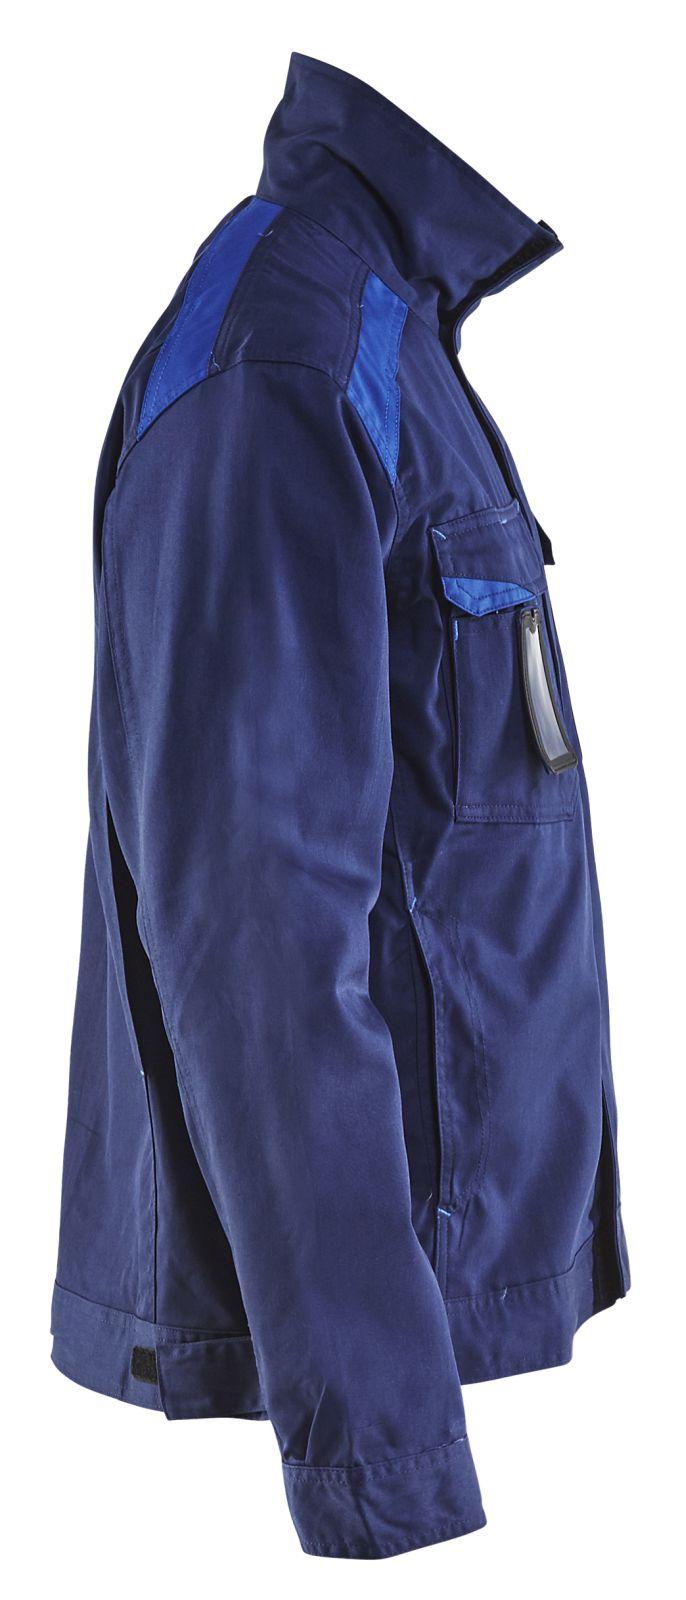 Blaklader Jassen 40541800 marineblauw-korenblauw(8985)